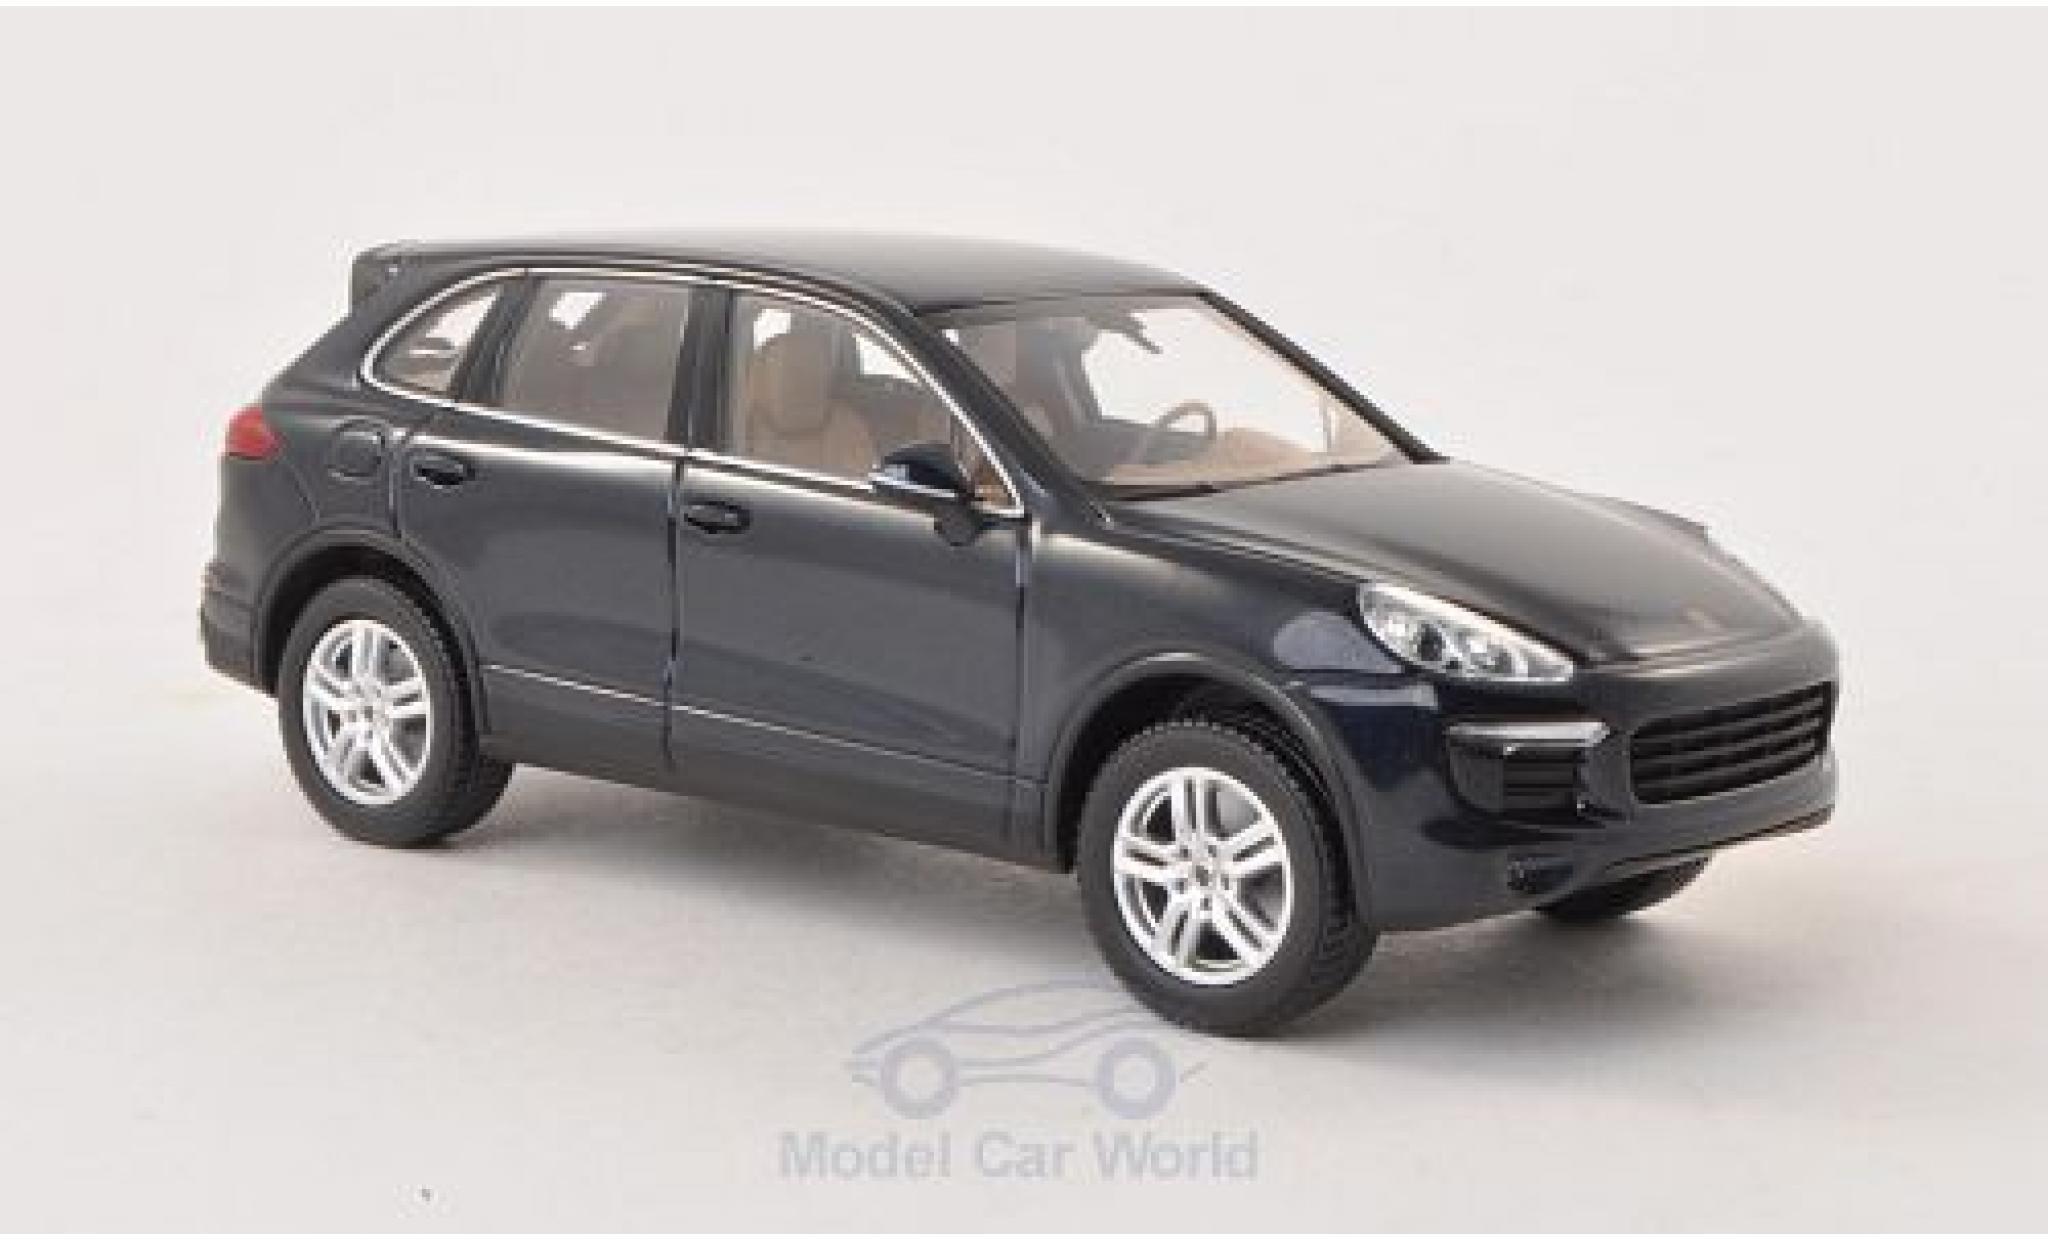 Porsche Cayenne 1/43 Minichamps S (92A) metallic blue 2014 ohne Vitrine